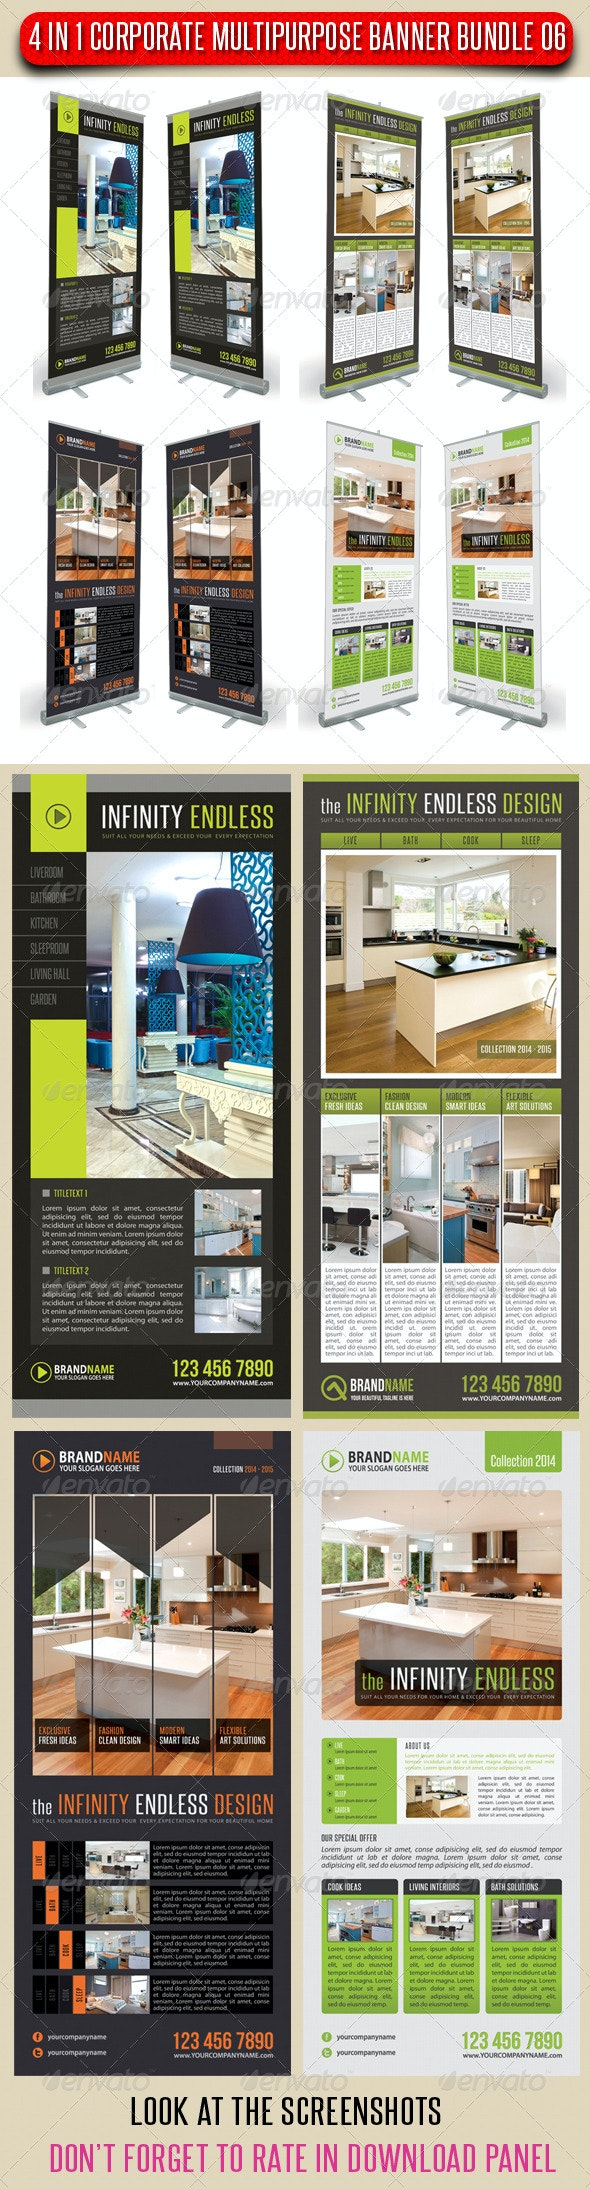 4 in 1 Corporate Multipurpose Banner Bundle 06 - Signage Print Templates